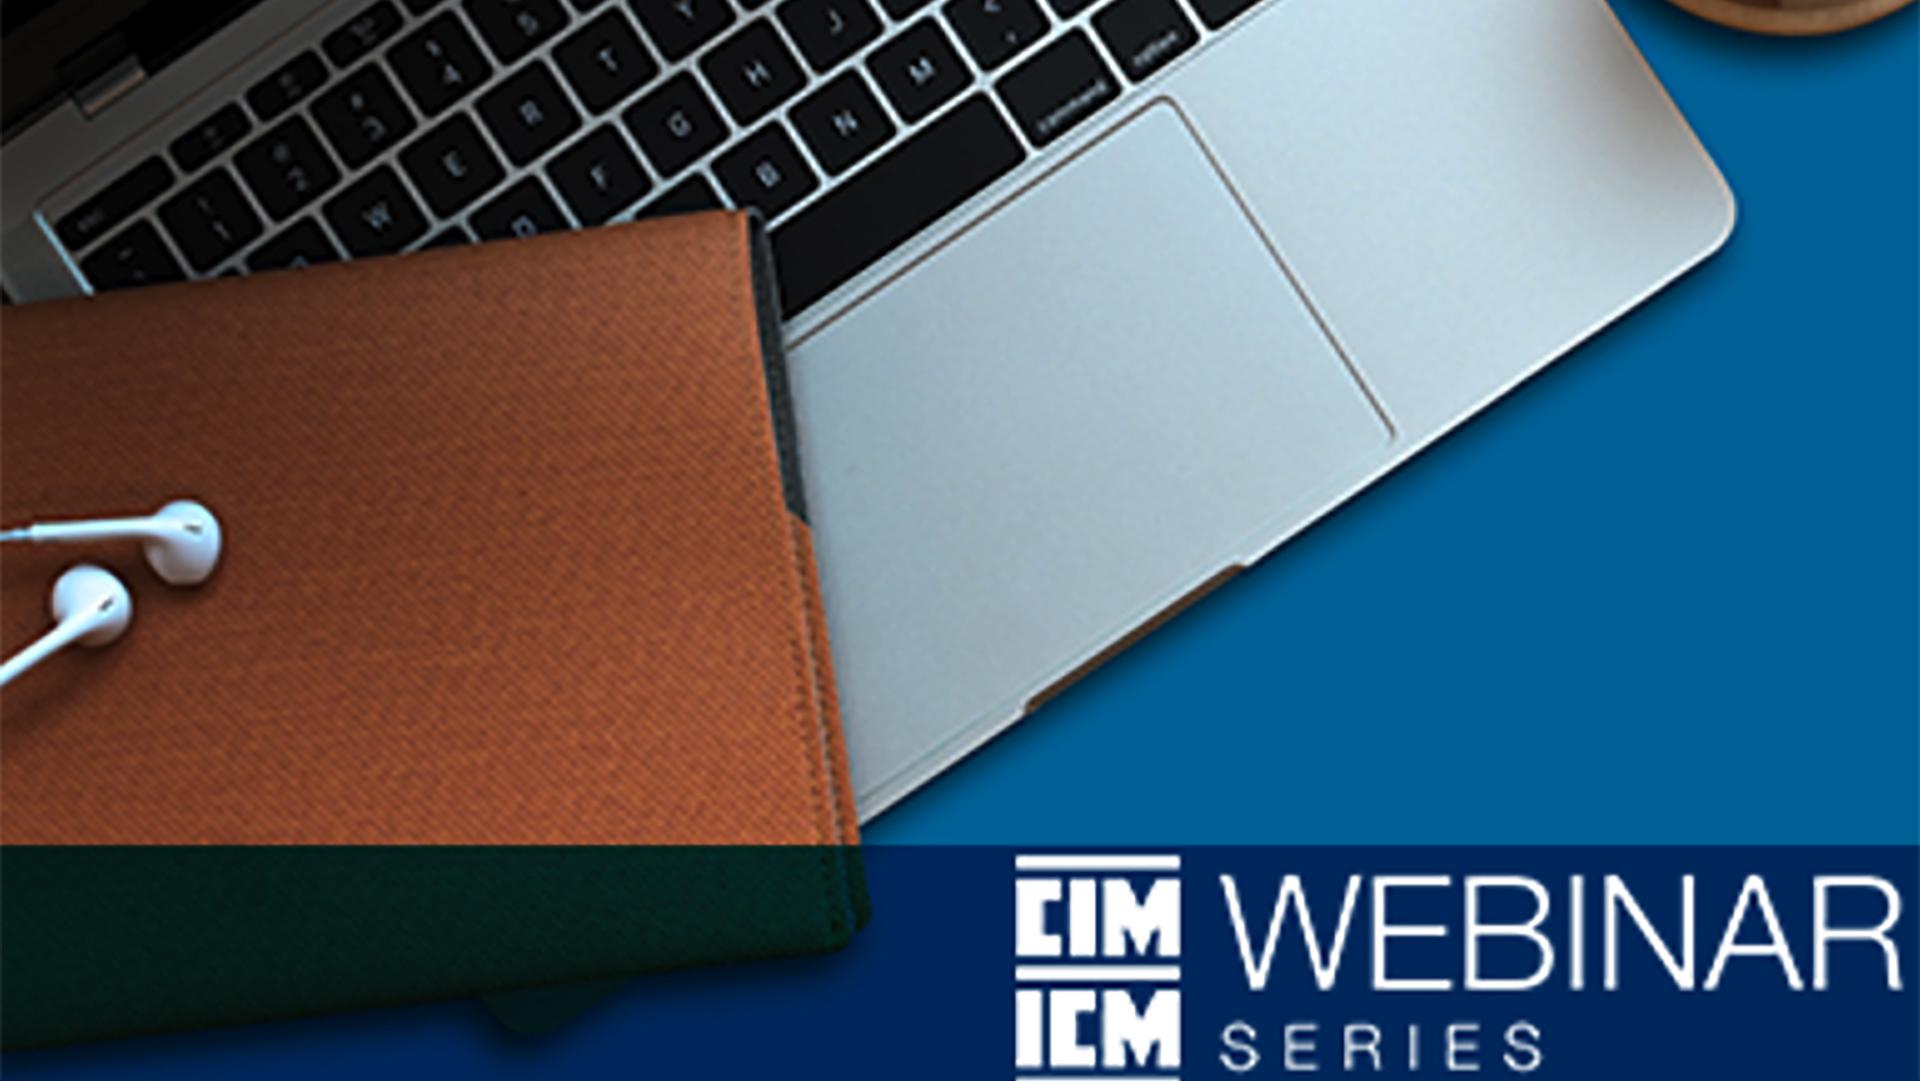 DataCloud presents primary crusher data at CIM Academy Webinar Series 2020